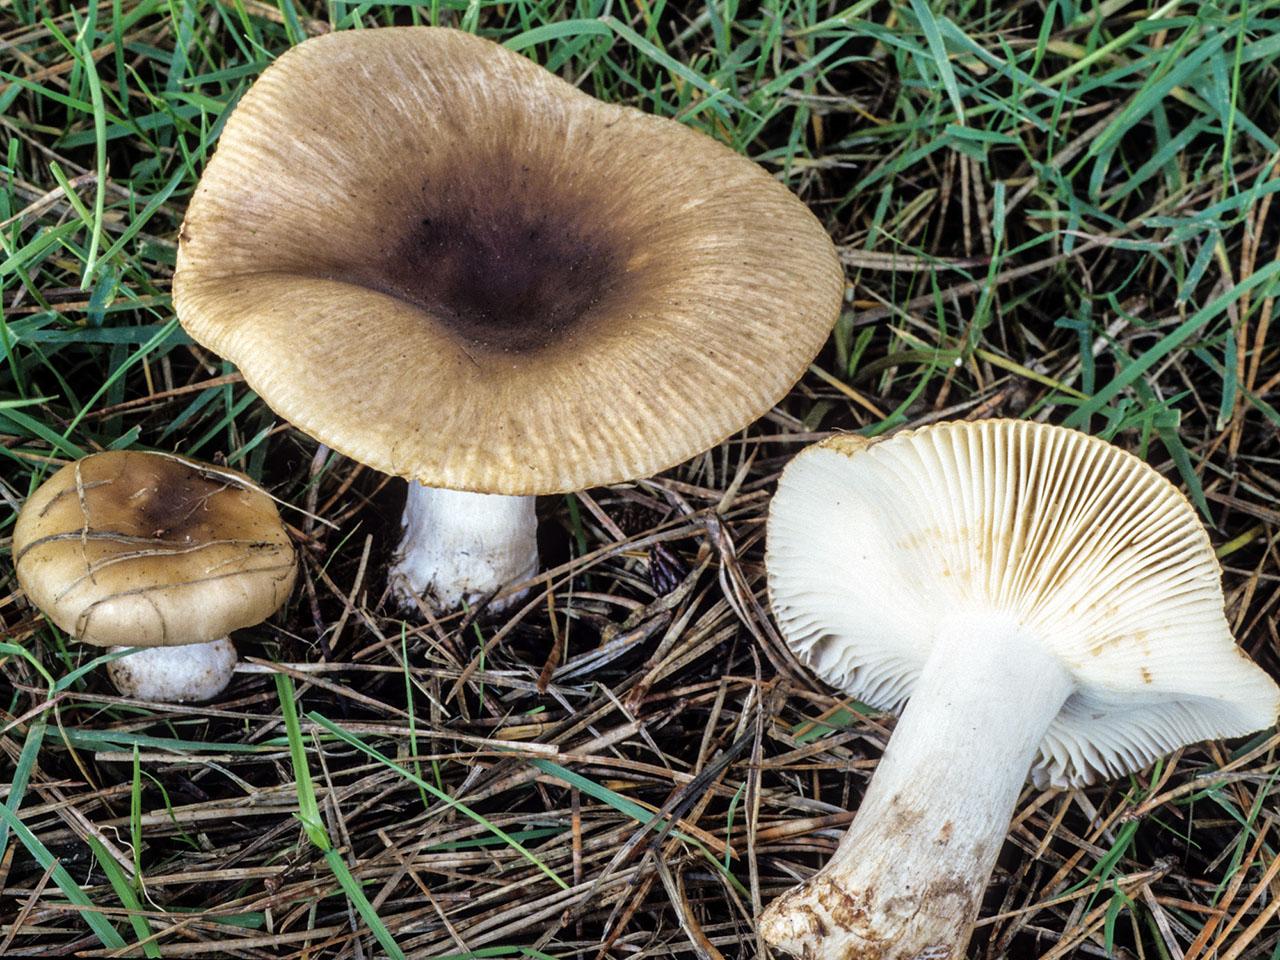 California Fungi Russula Cerolens